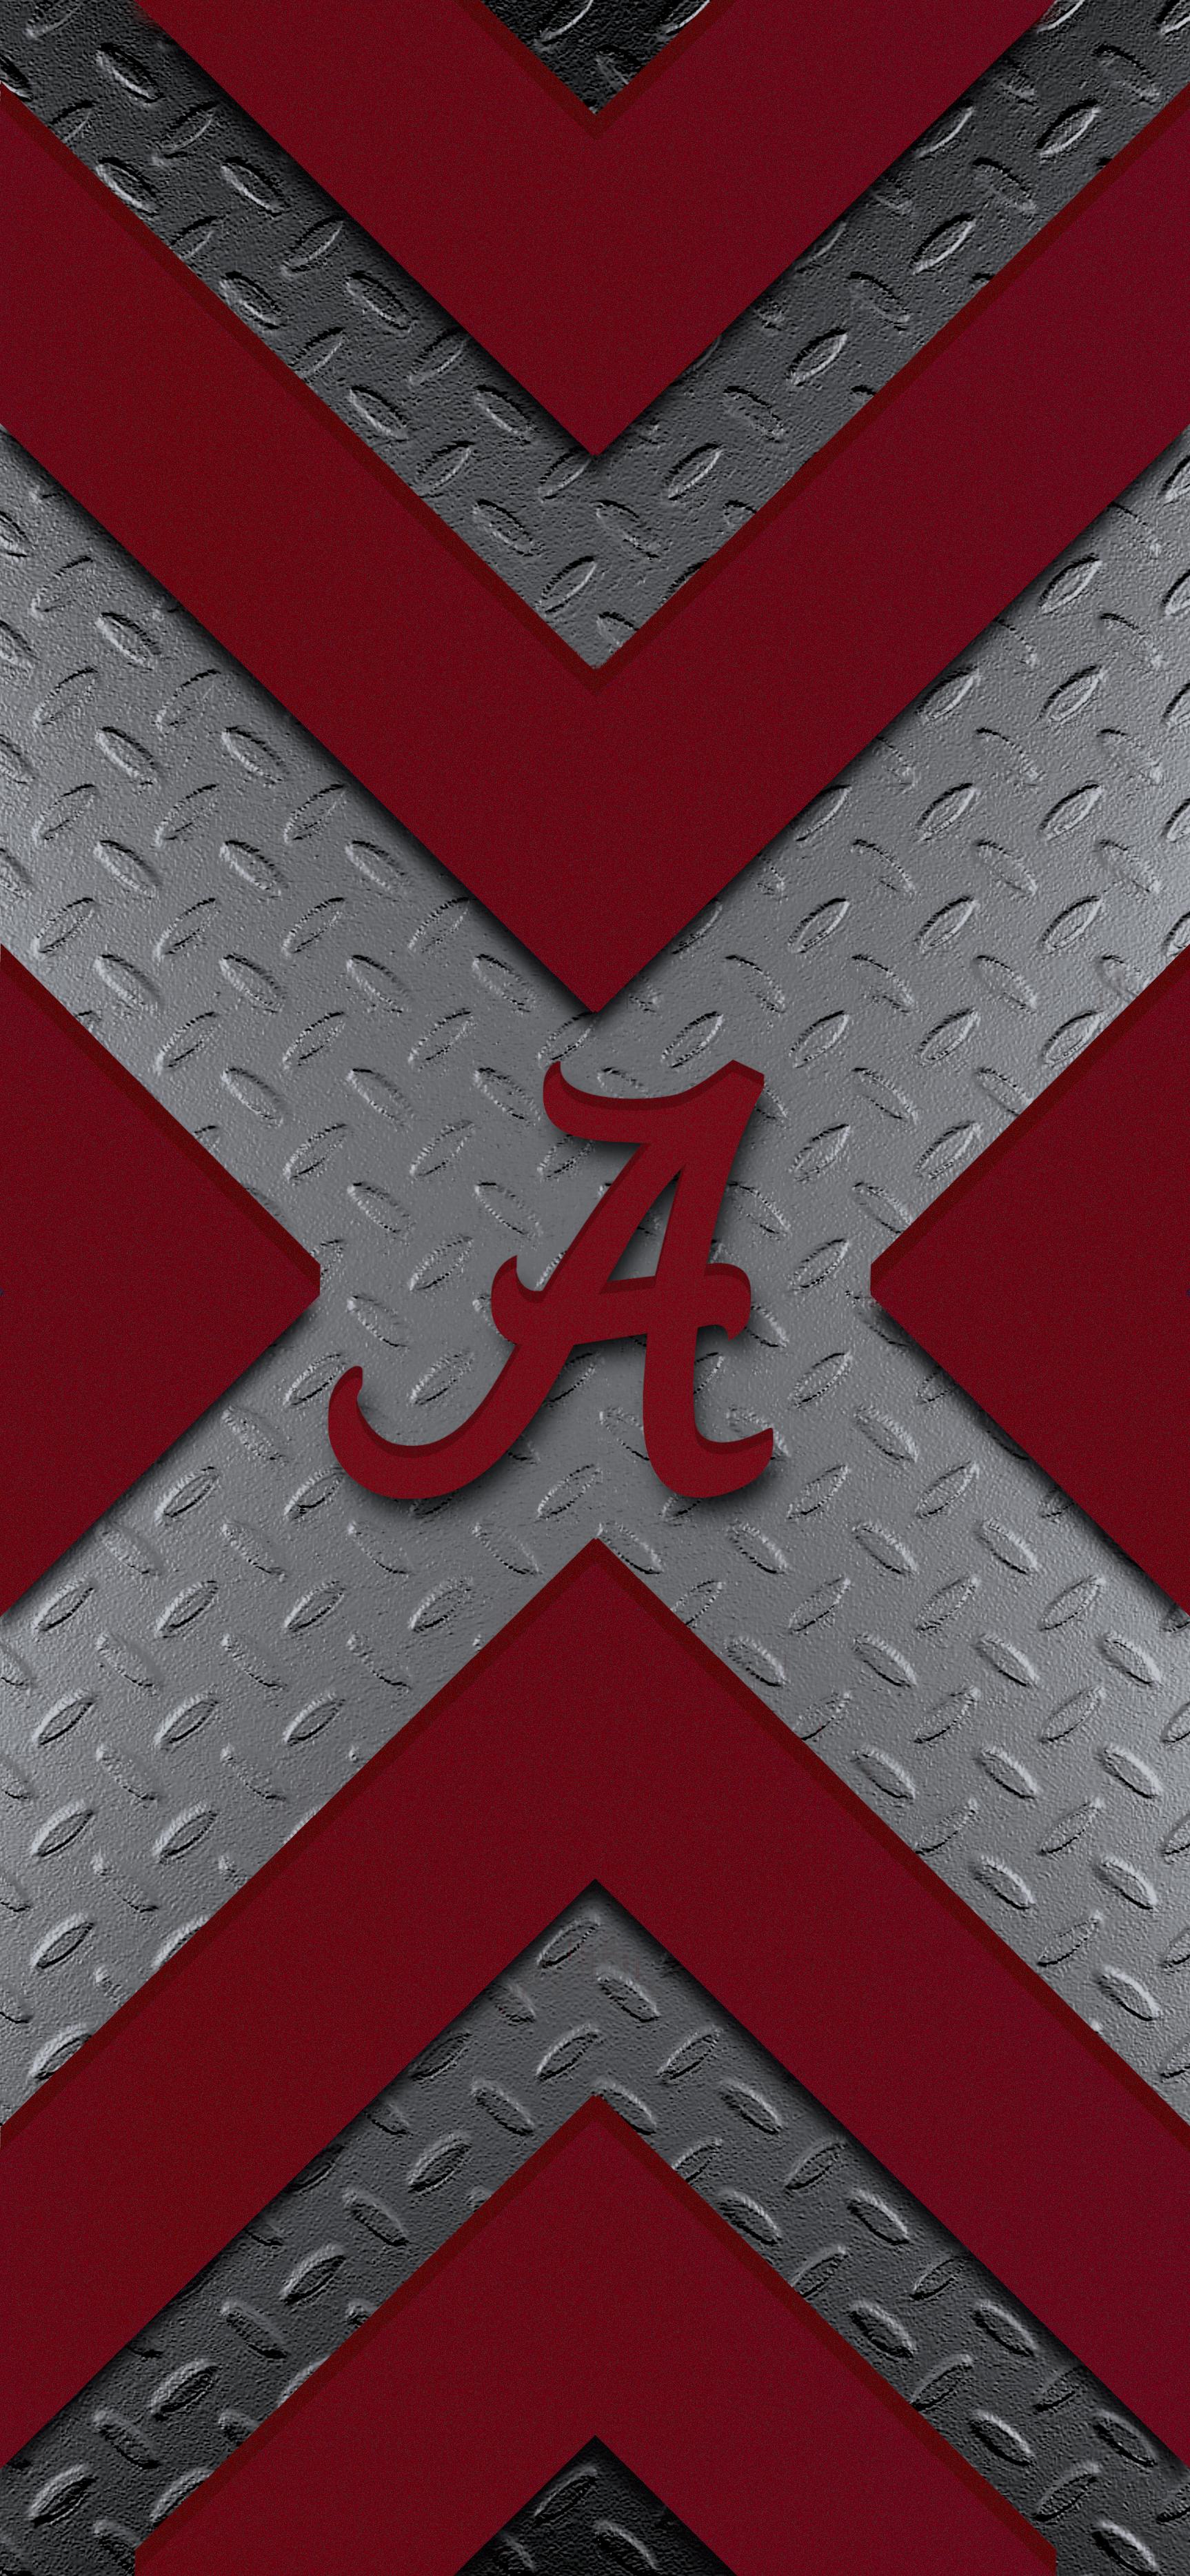 Modern Design 4 Metal Alabama Crimson Tide Football Wallpaper Alabama Wallpaper Alabama Crimson Tide Football